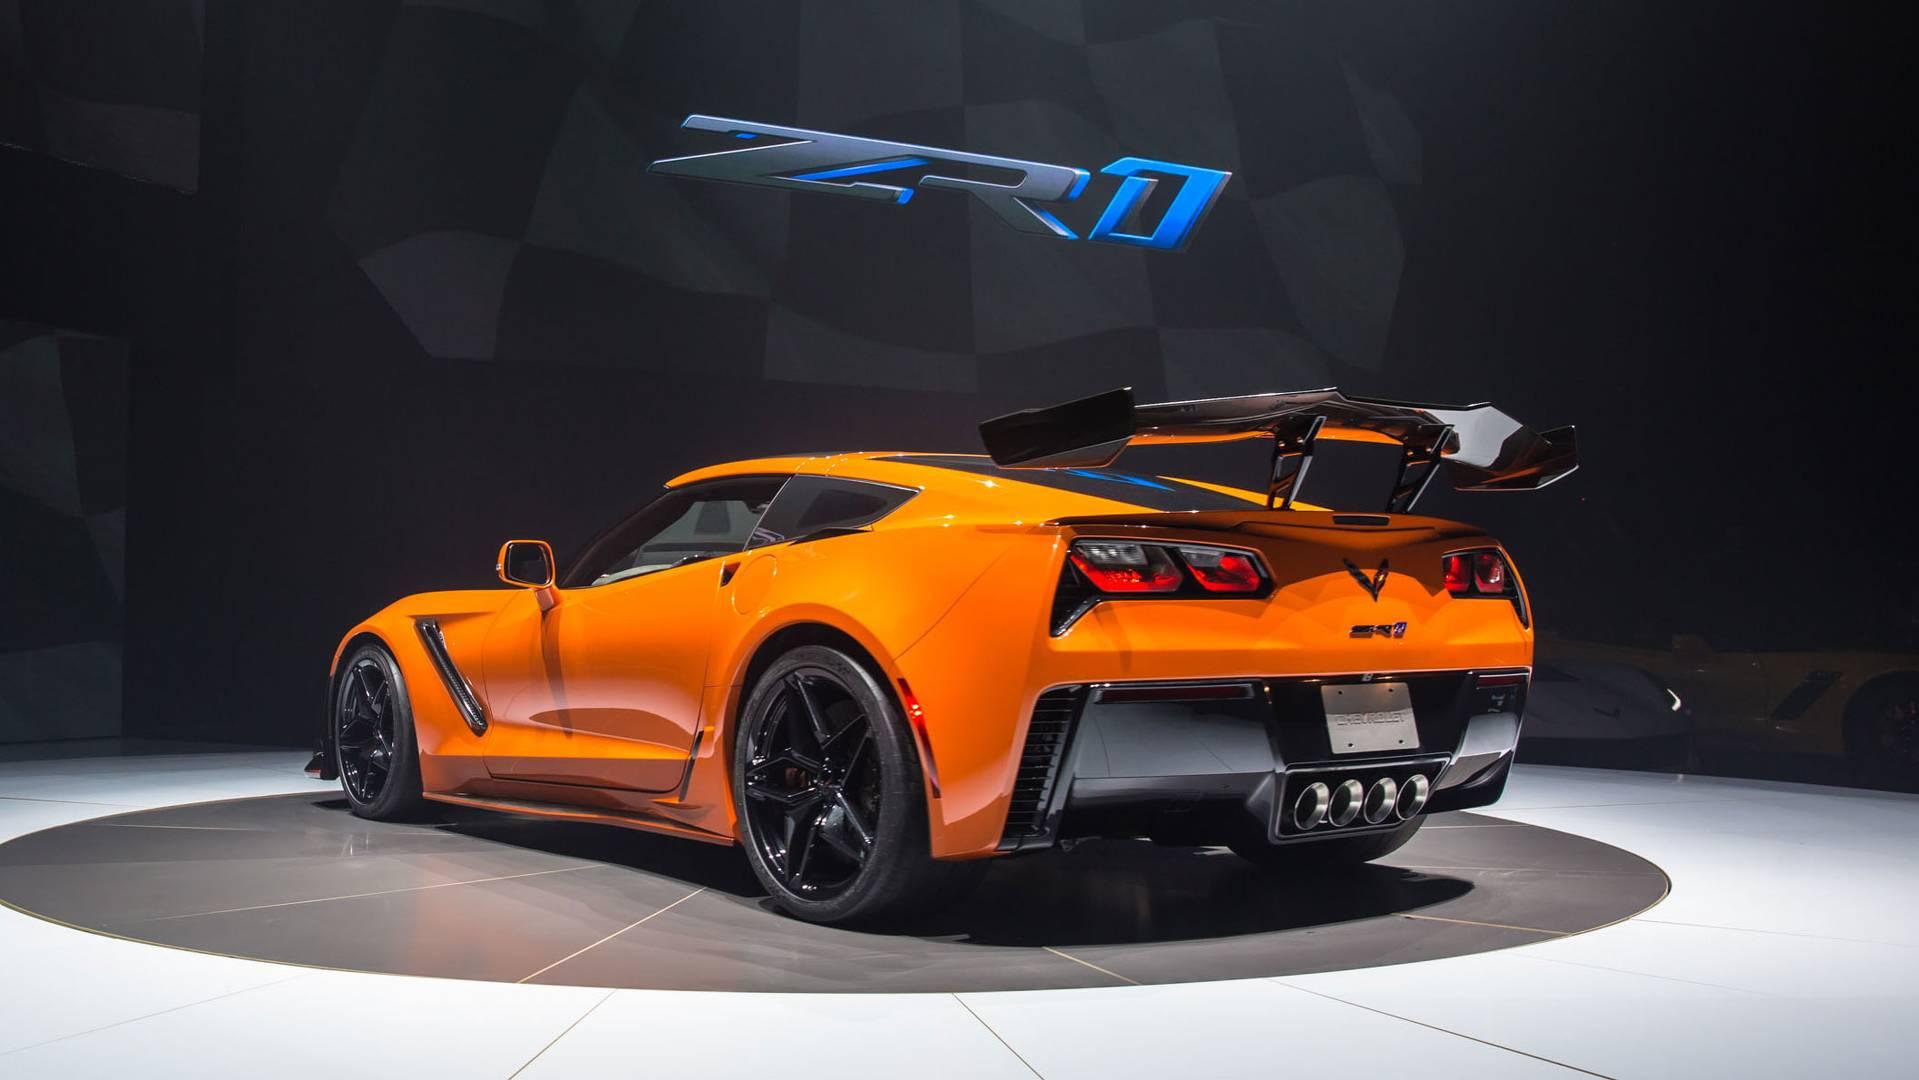 2018 Corvette Zr1 >> 2019 Chevy Corvette ZR1 Debuts With 755 Horsepower